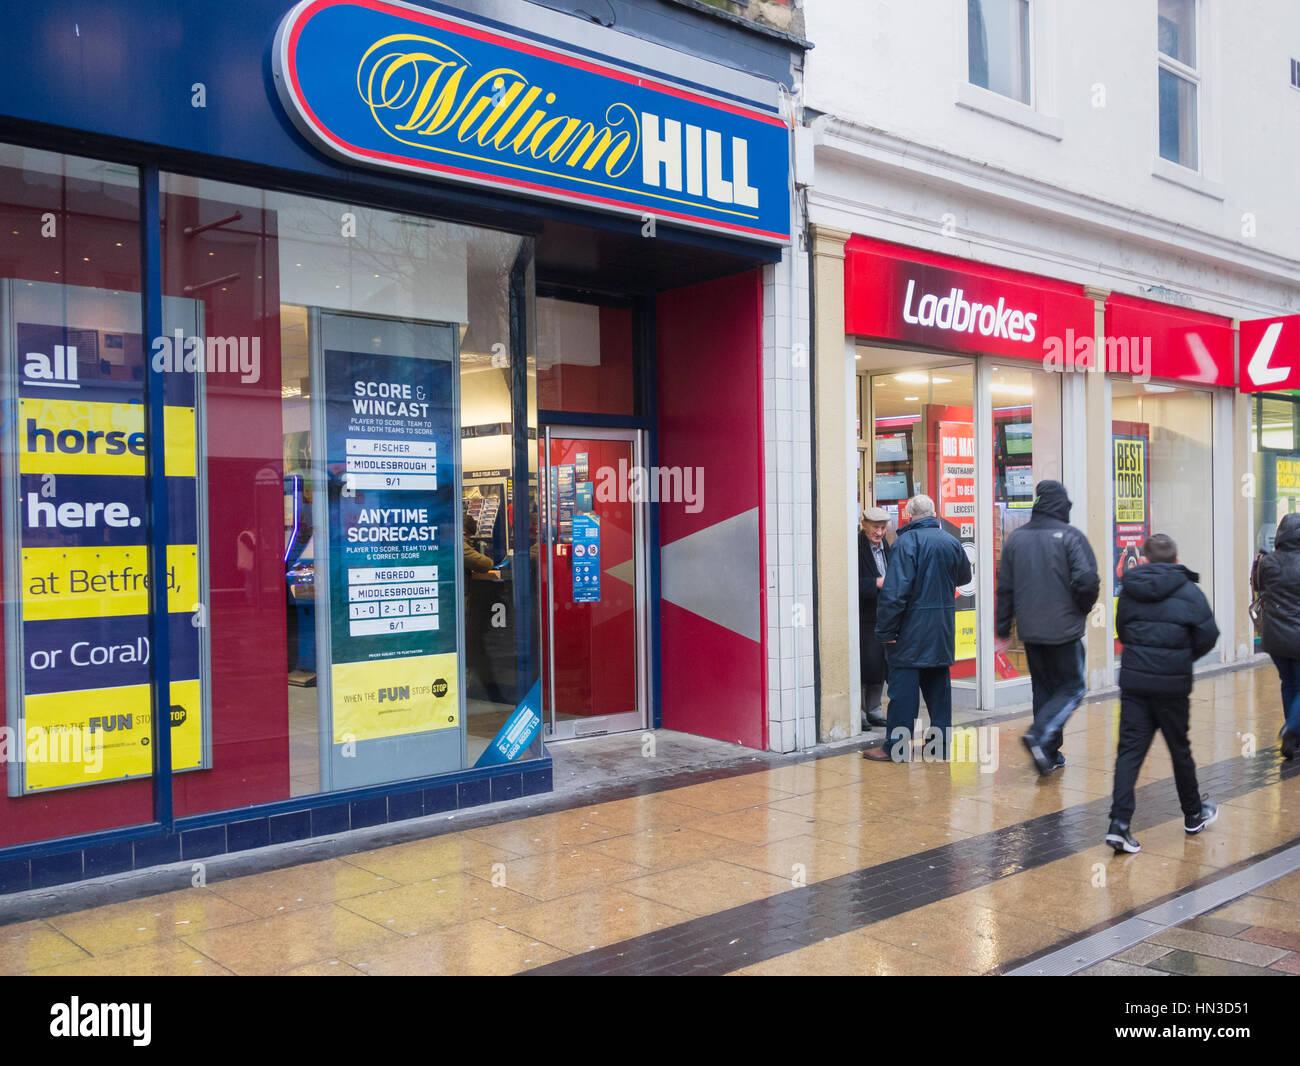 Betting shops in england niort vs dijon bettingexpert football